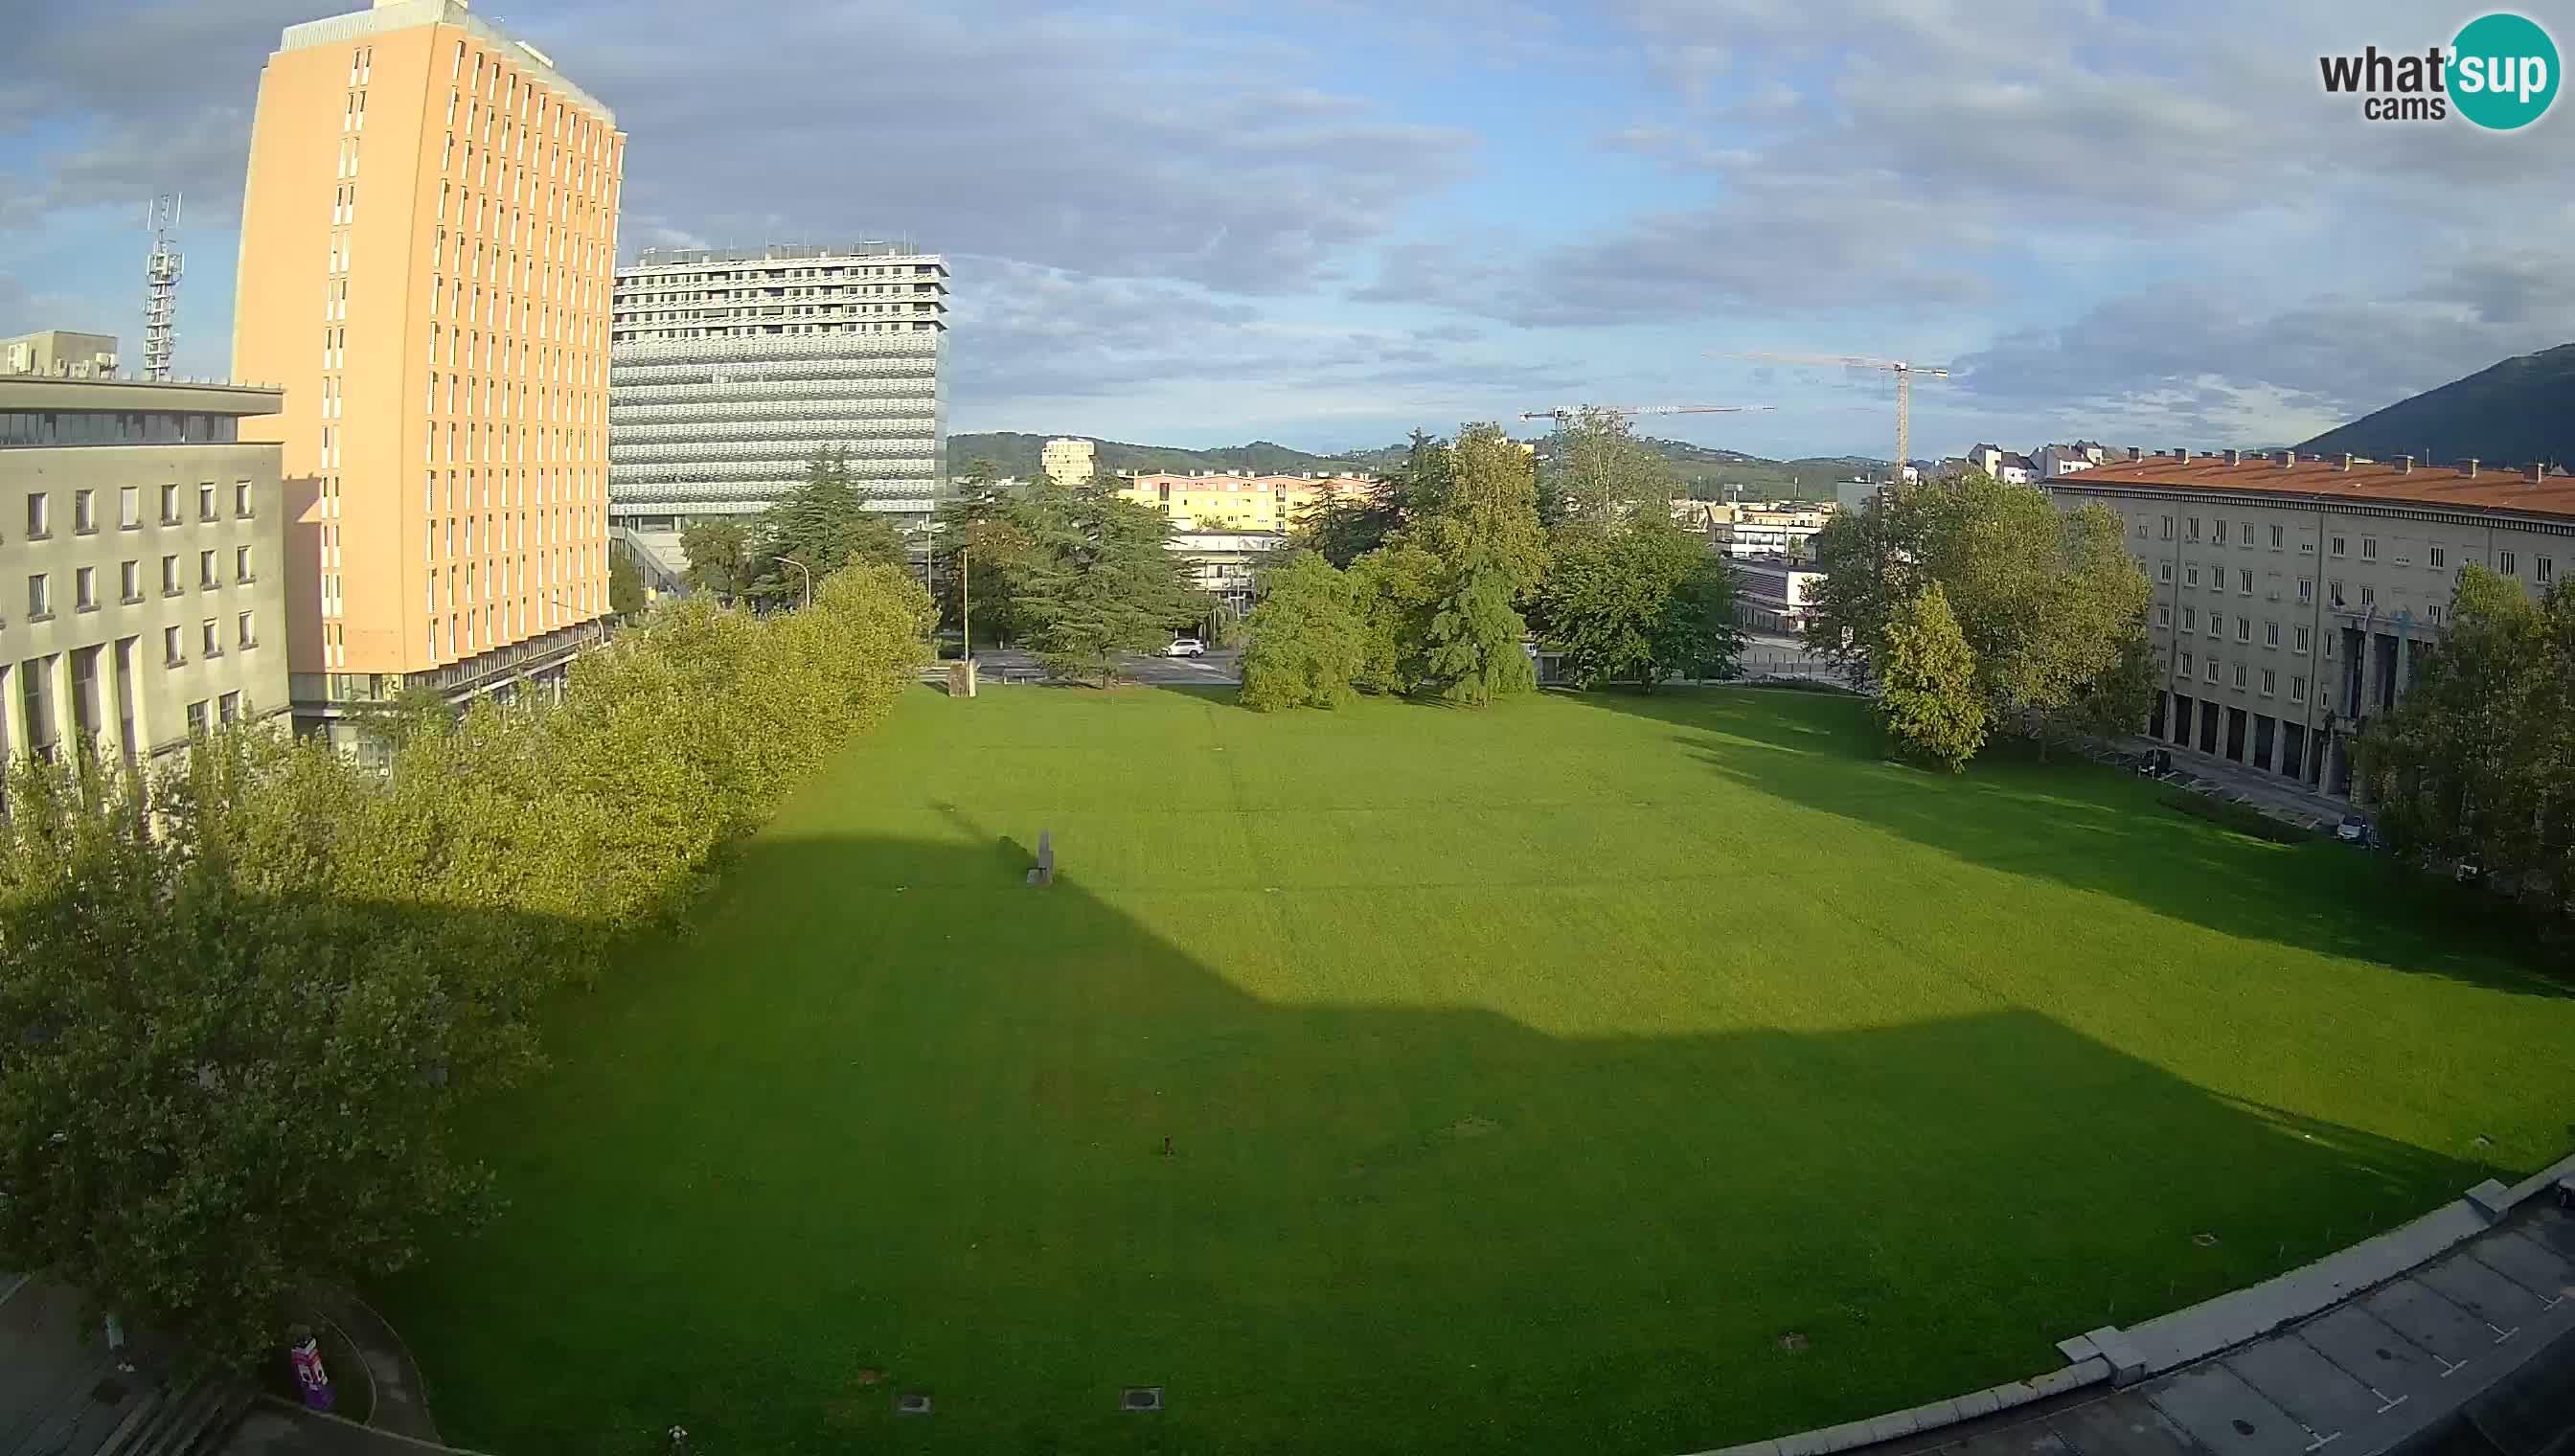 Nova Gorica Sat. 07:36